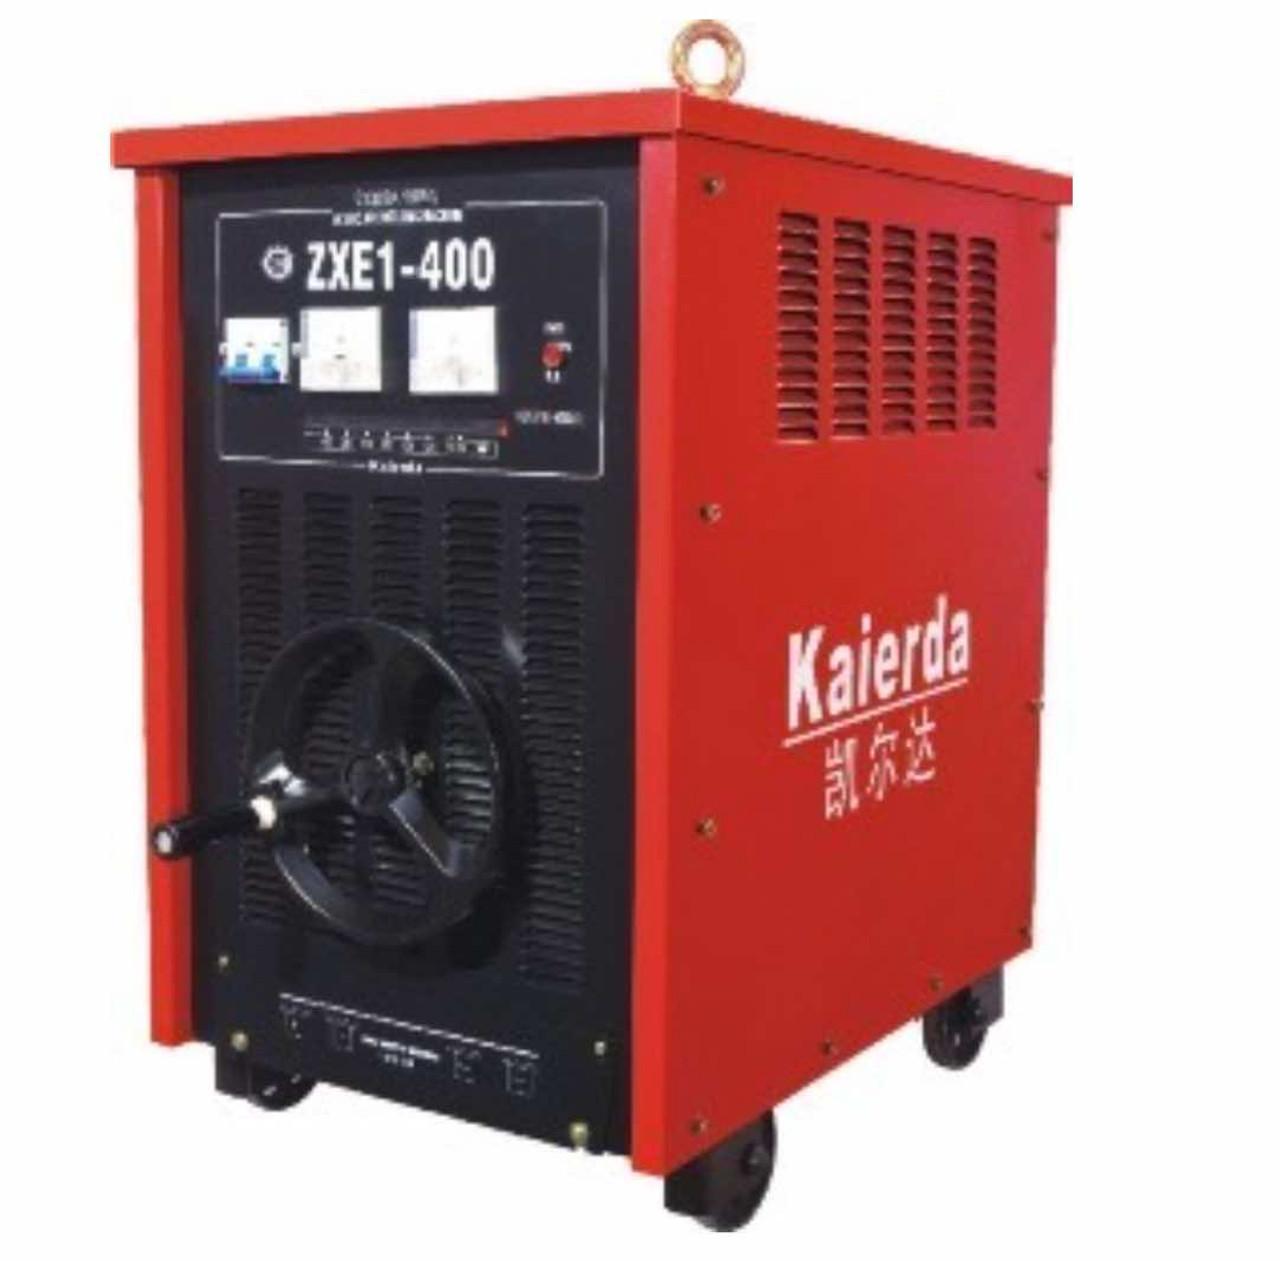 Welding Machine For Sale >> Kaierda Welder Zxe1 400 Welding Machine